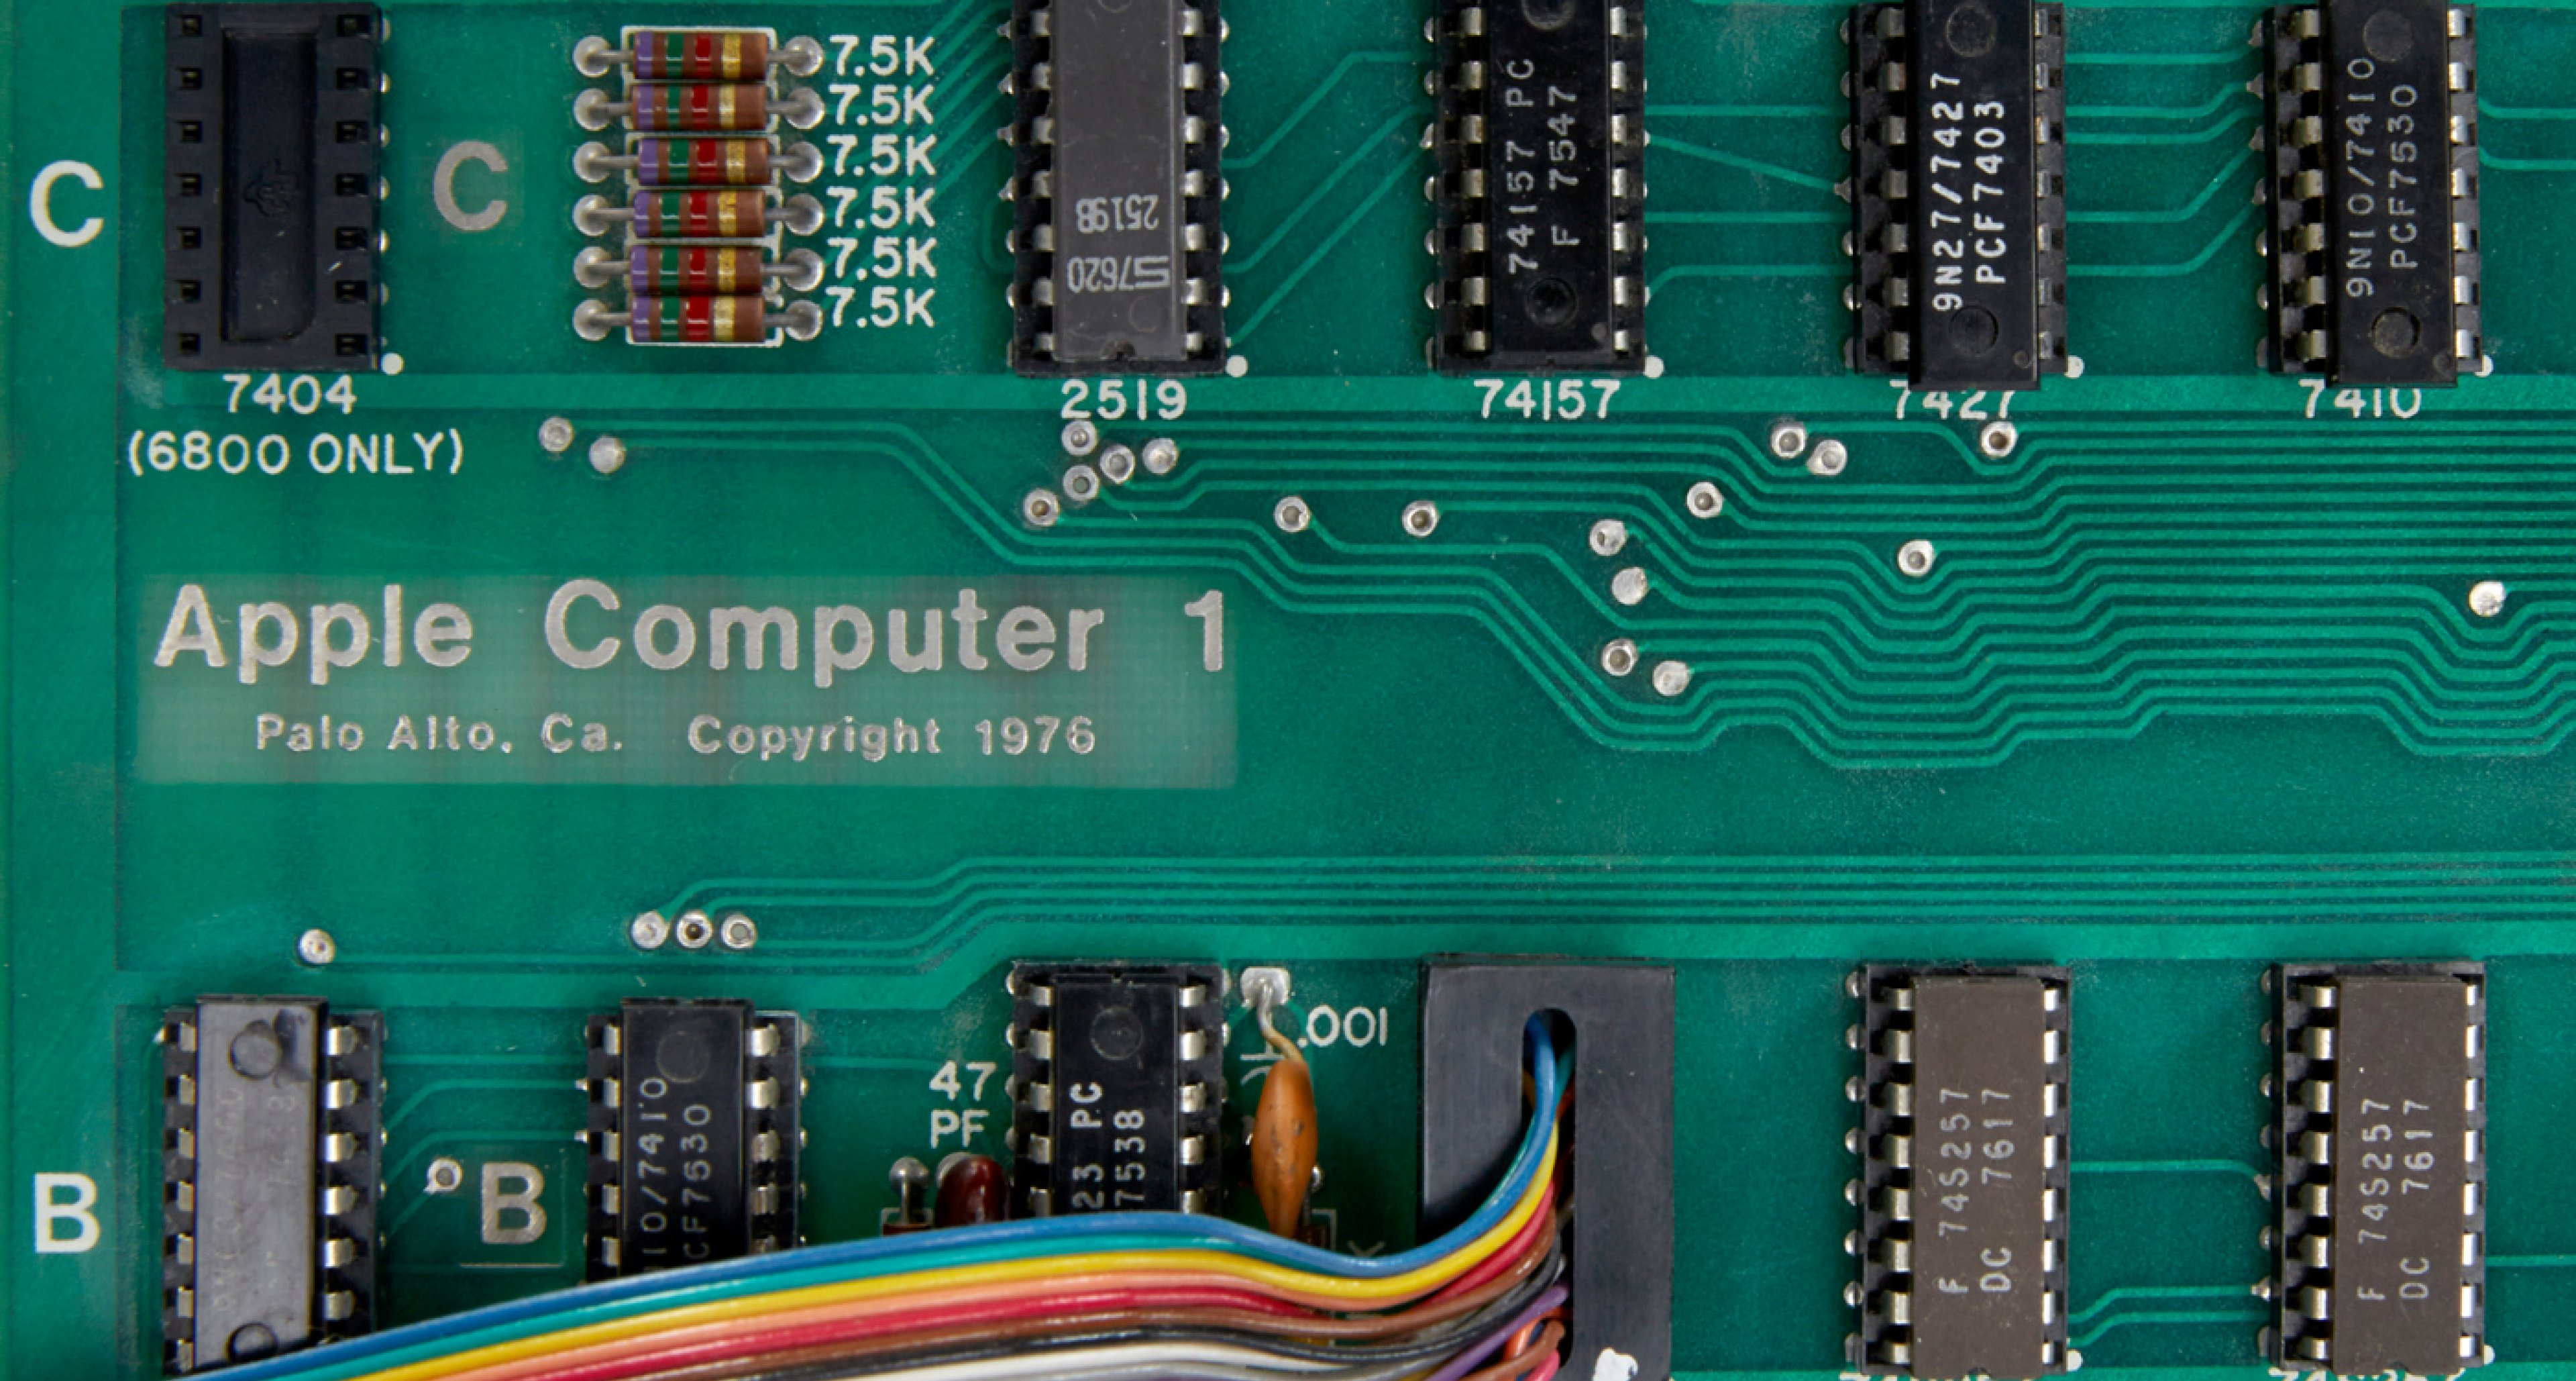 Apple 1 Computer, Apple 1 Motherboard